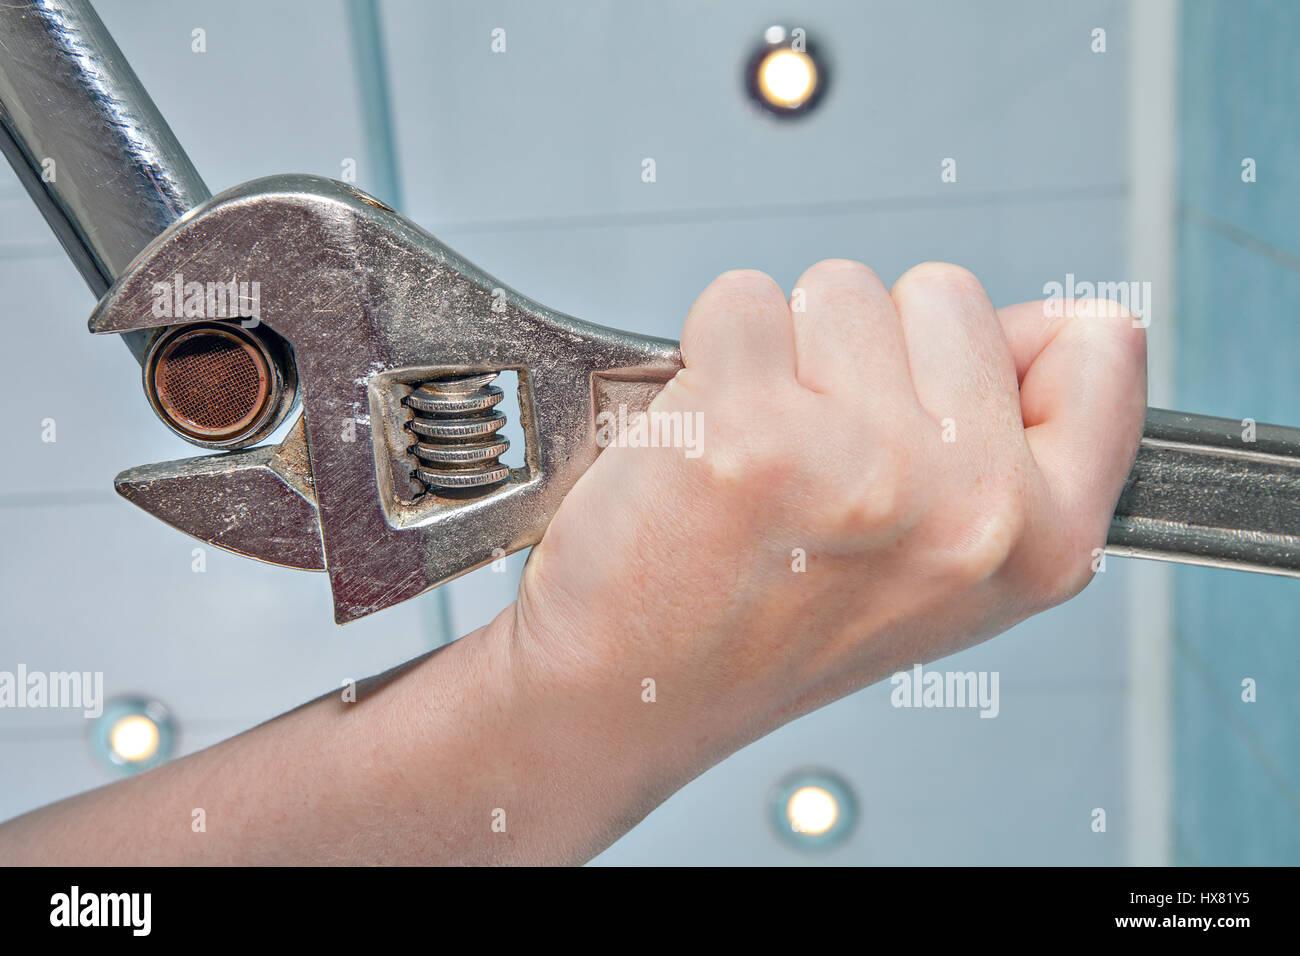 Clogged Faucet Stock Photos & Clogged Faucet Stock Images - Alamy